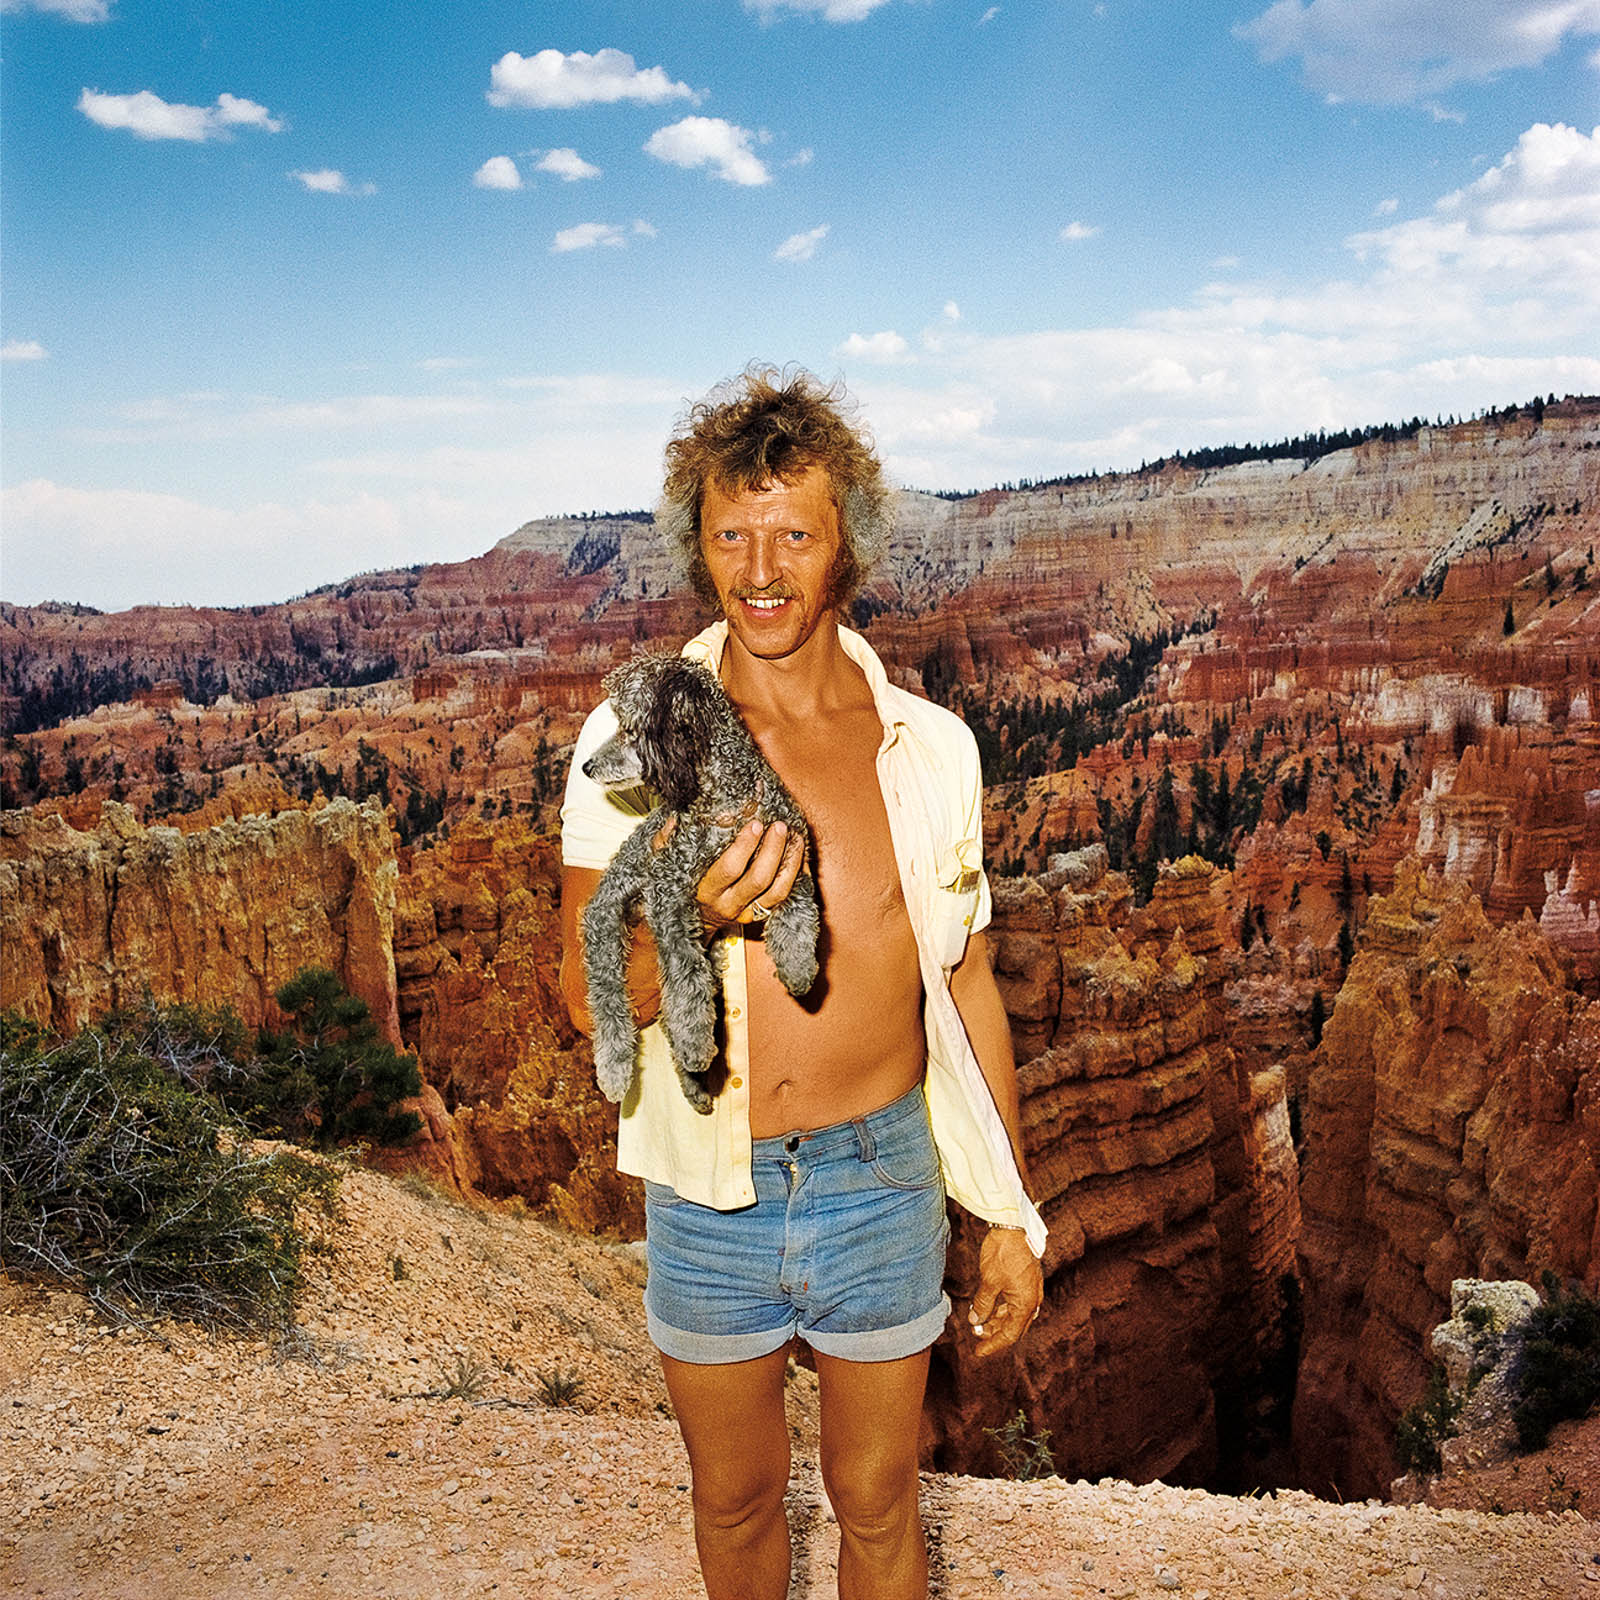 Man Holding Poodle, Bryce Canyon National Park, Utah 1980